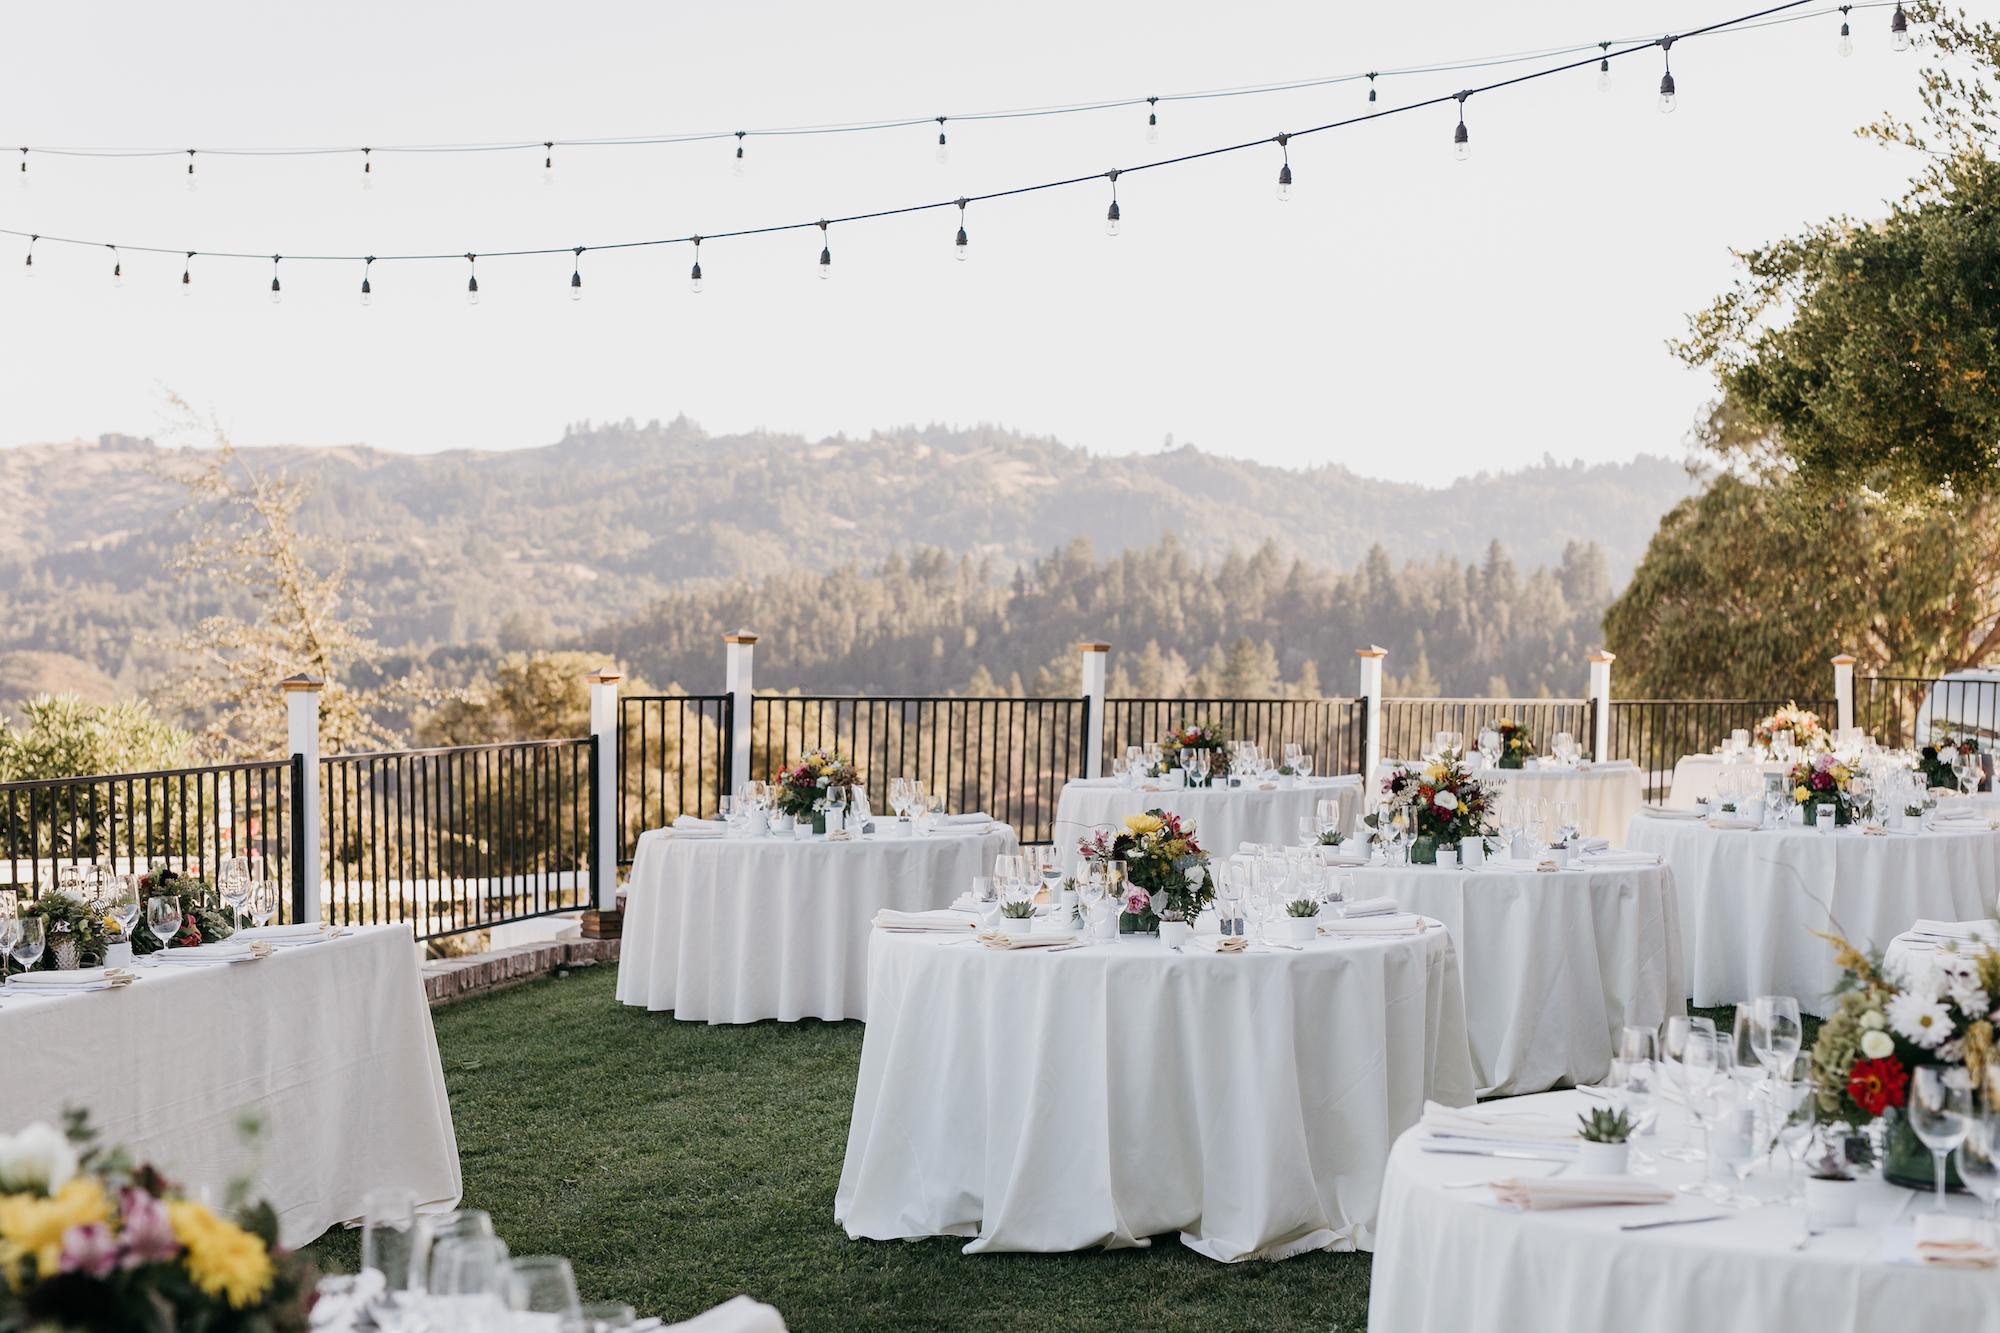 anvil-vineyards-wedding-photographer527.jpg